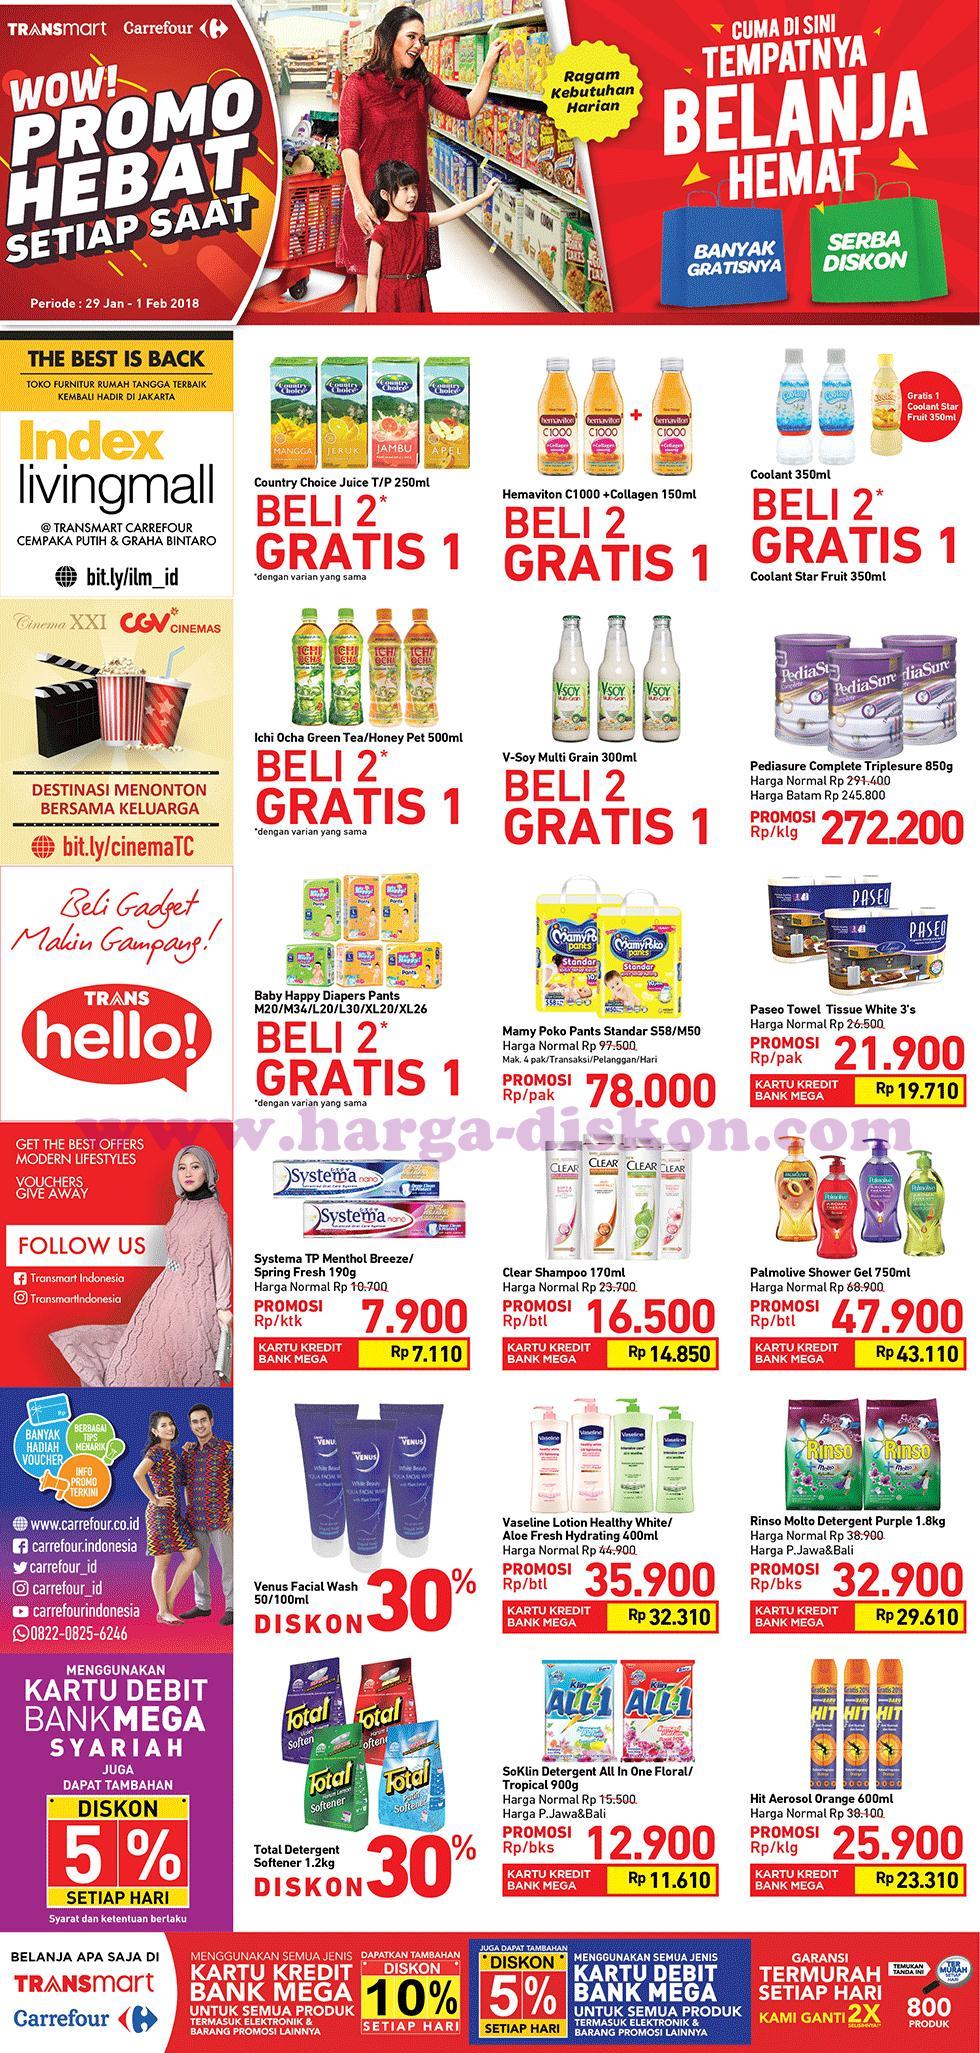 Katalog Promo Carrefour Terbaru Promo Gajian Periode 29 Januari 01